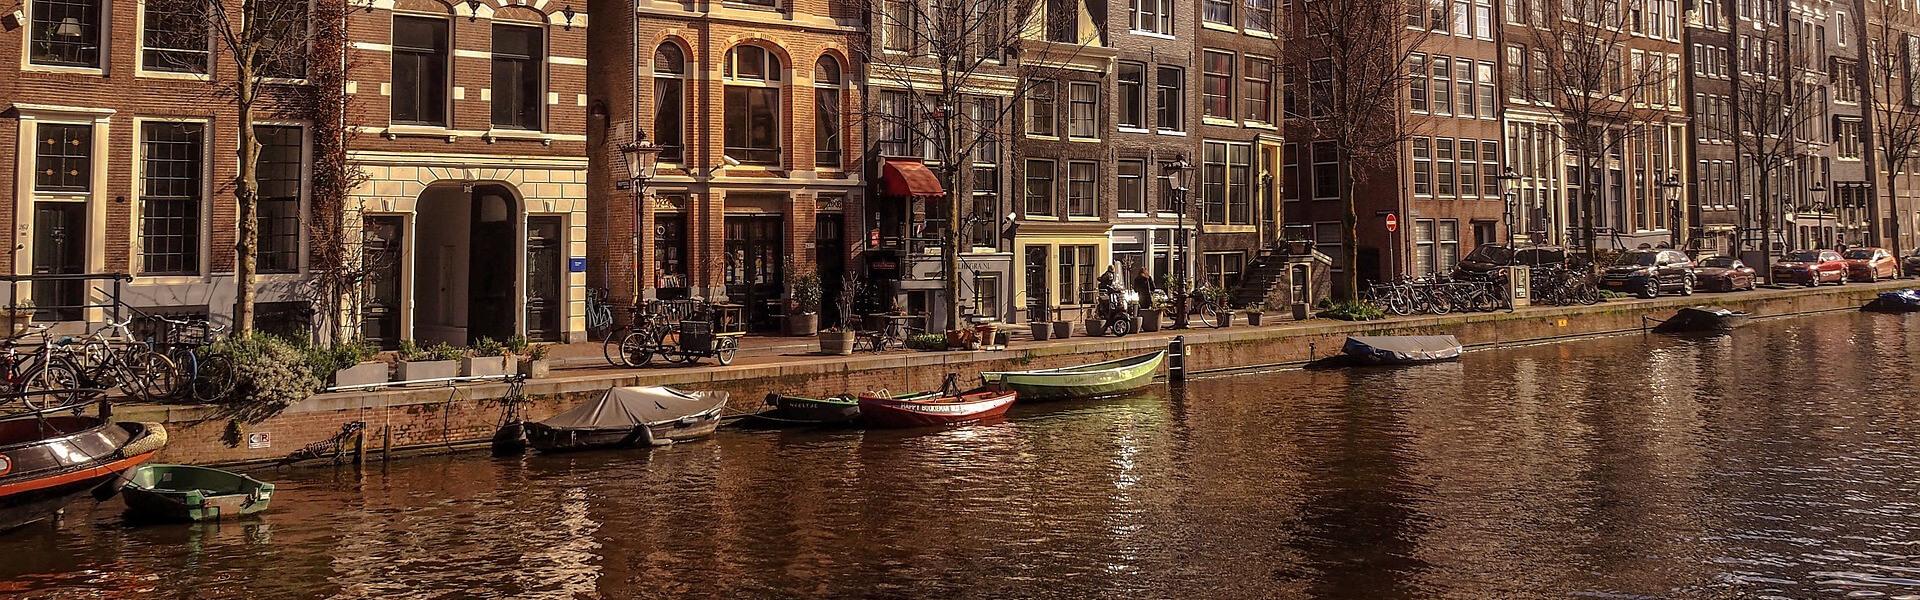 Buy Fauna Audio Eyewear in Amsterdam